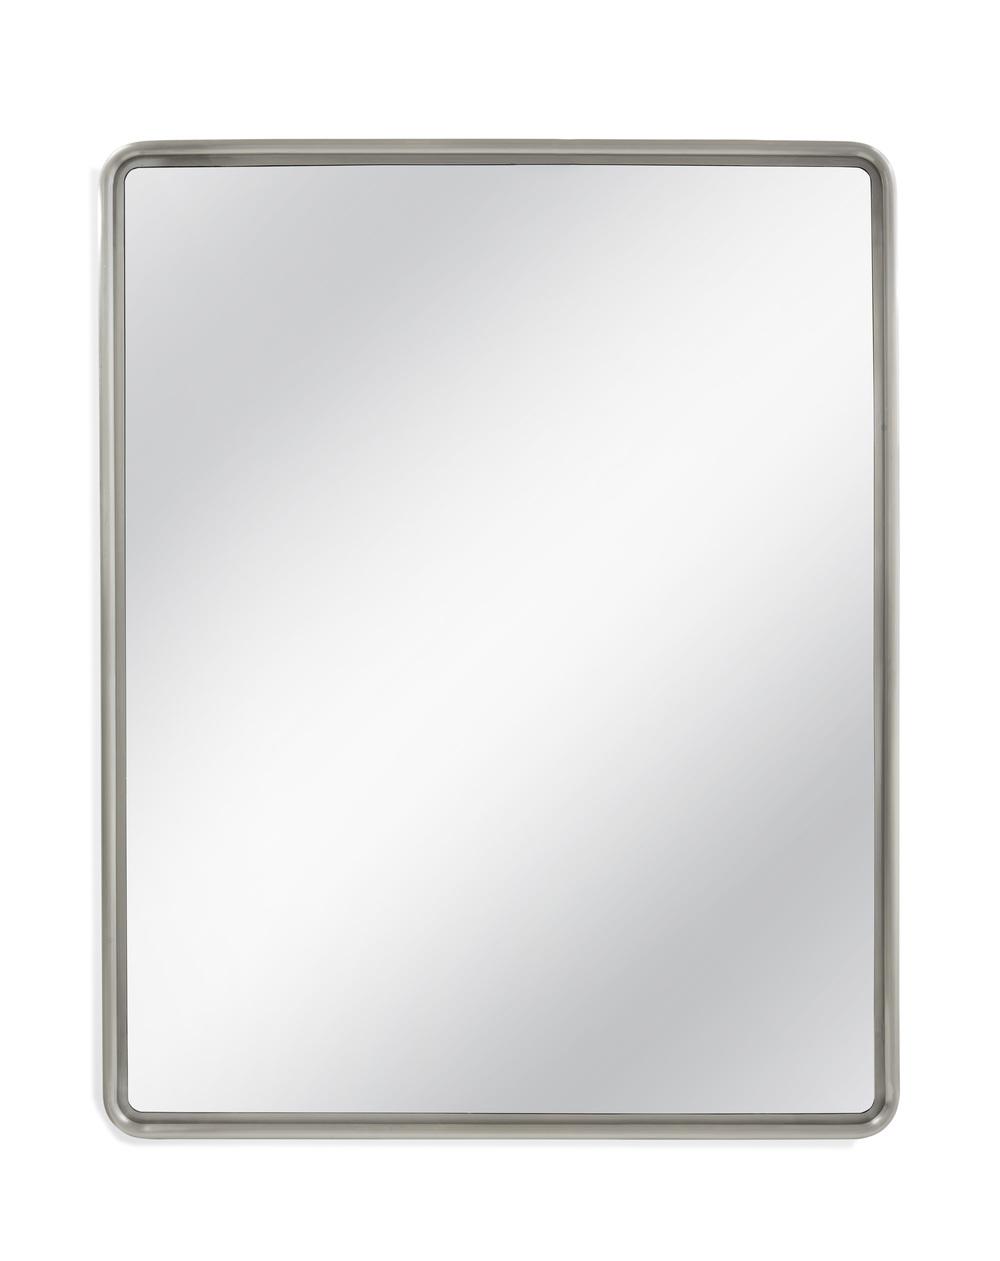 Bassett Mirror Company - Andes Wall Mirror